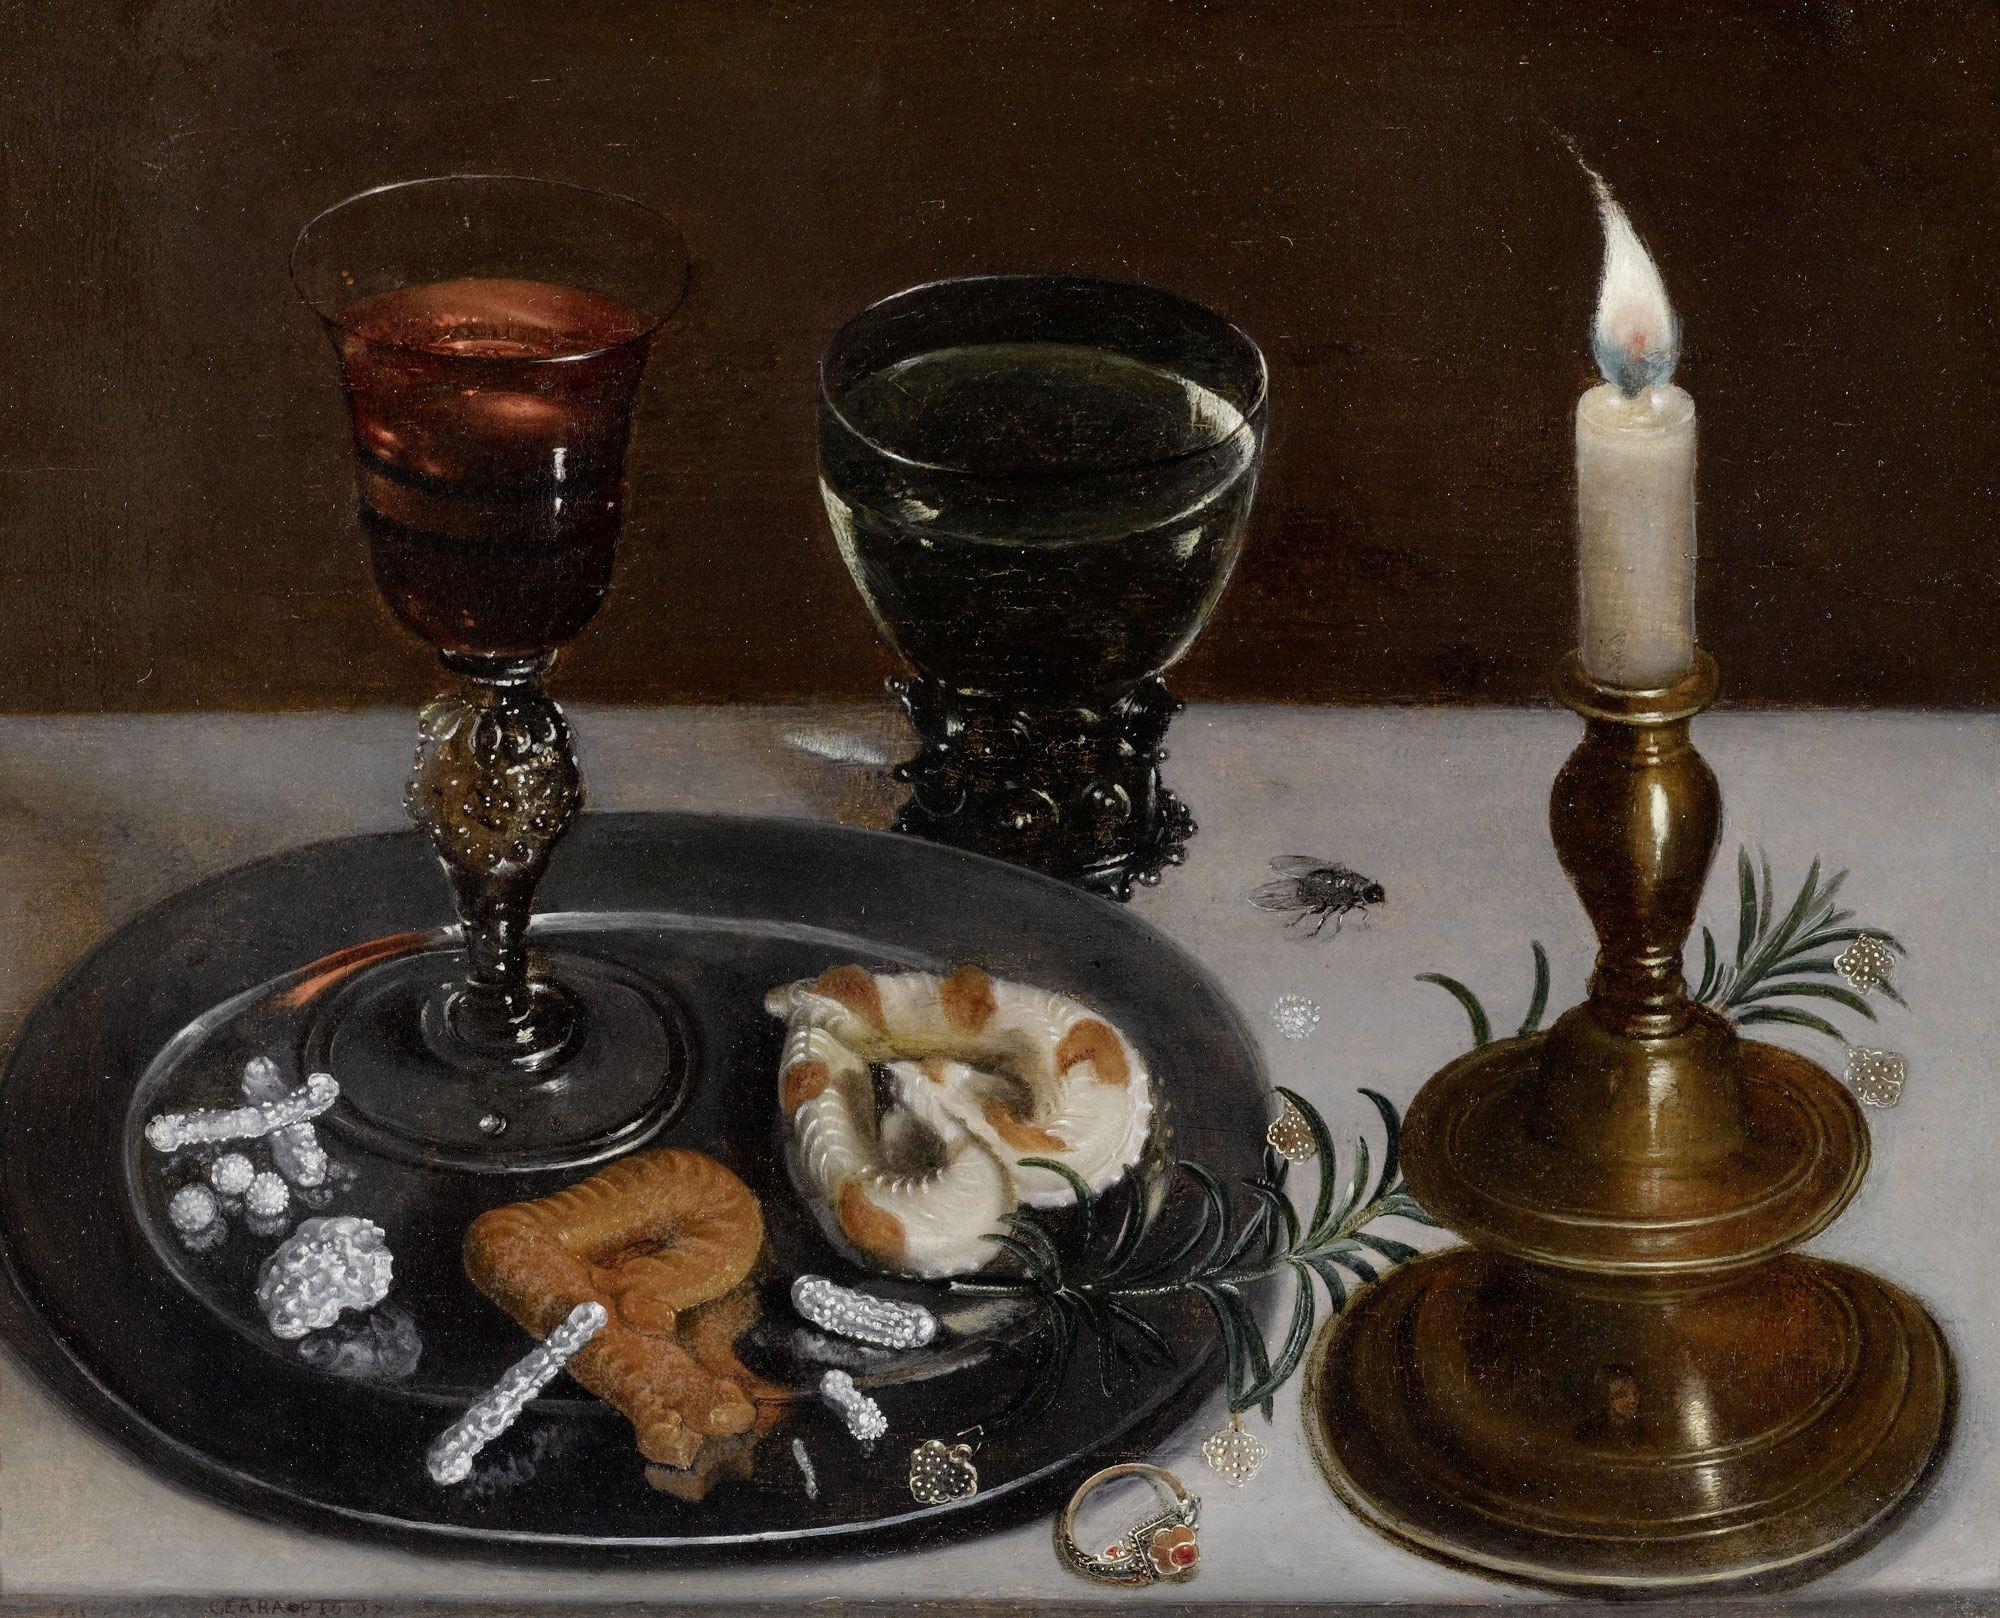 Clara Peeters, Stilleven met letterkoekjes, 1607, RKD